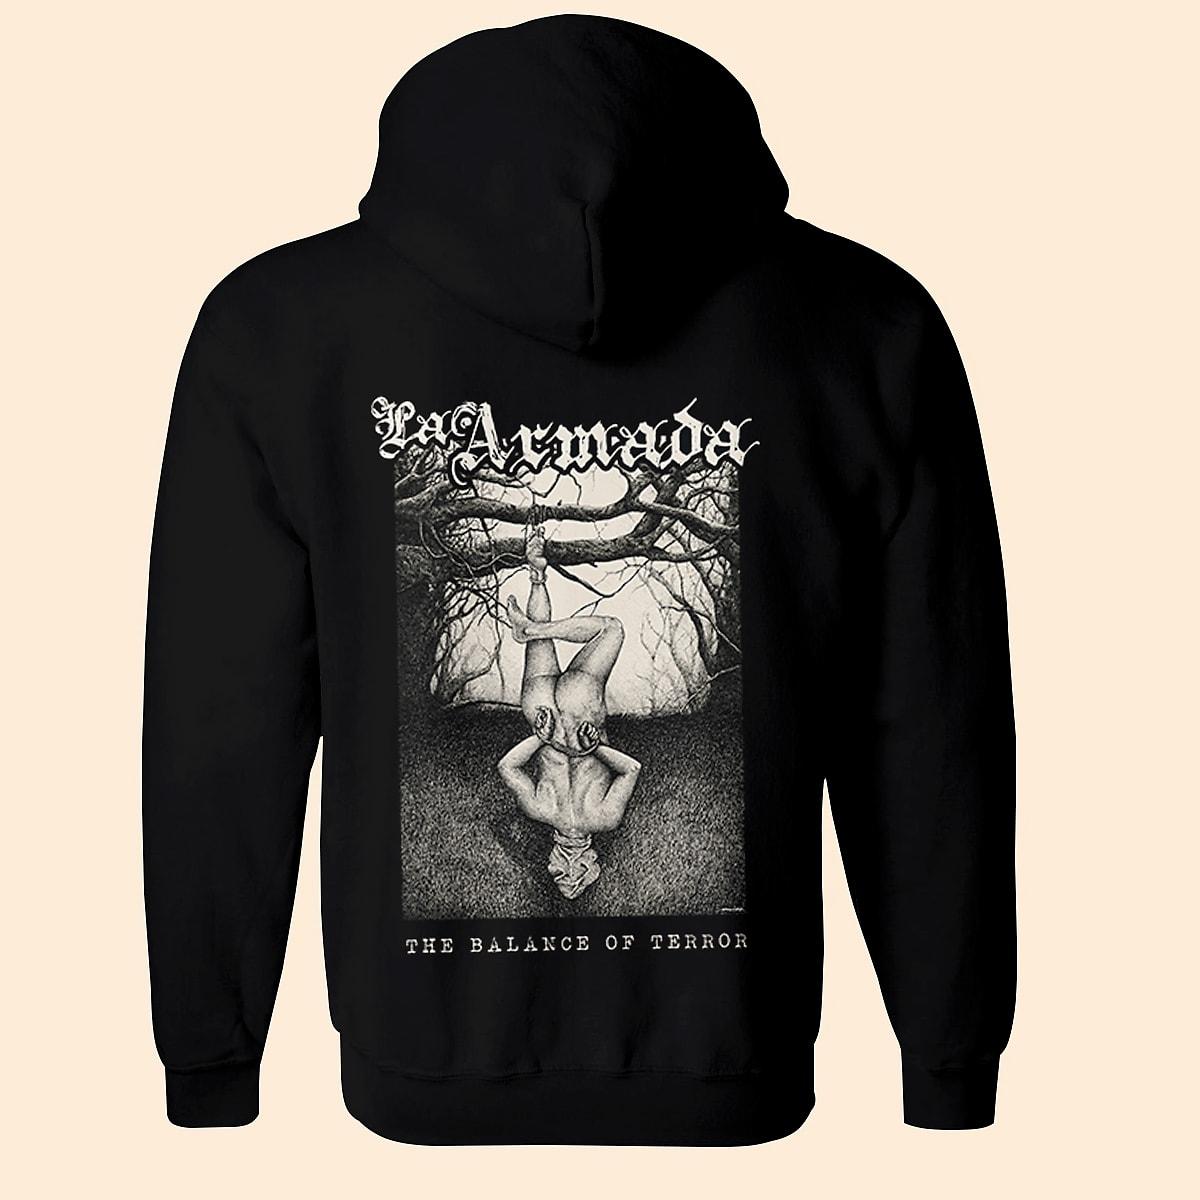 La Armada - The Balance Of Terror - Hoodie  - XL